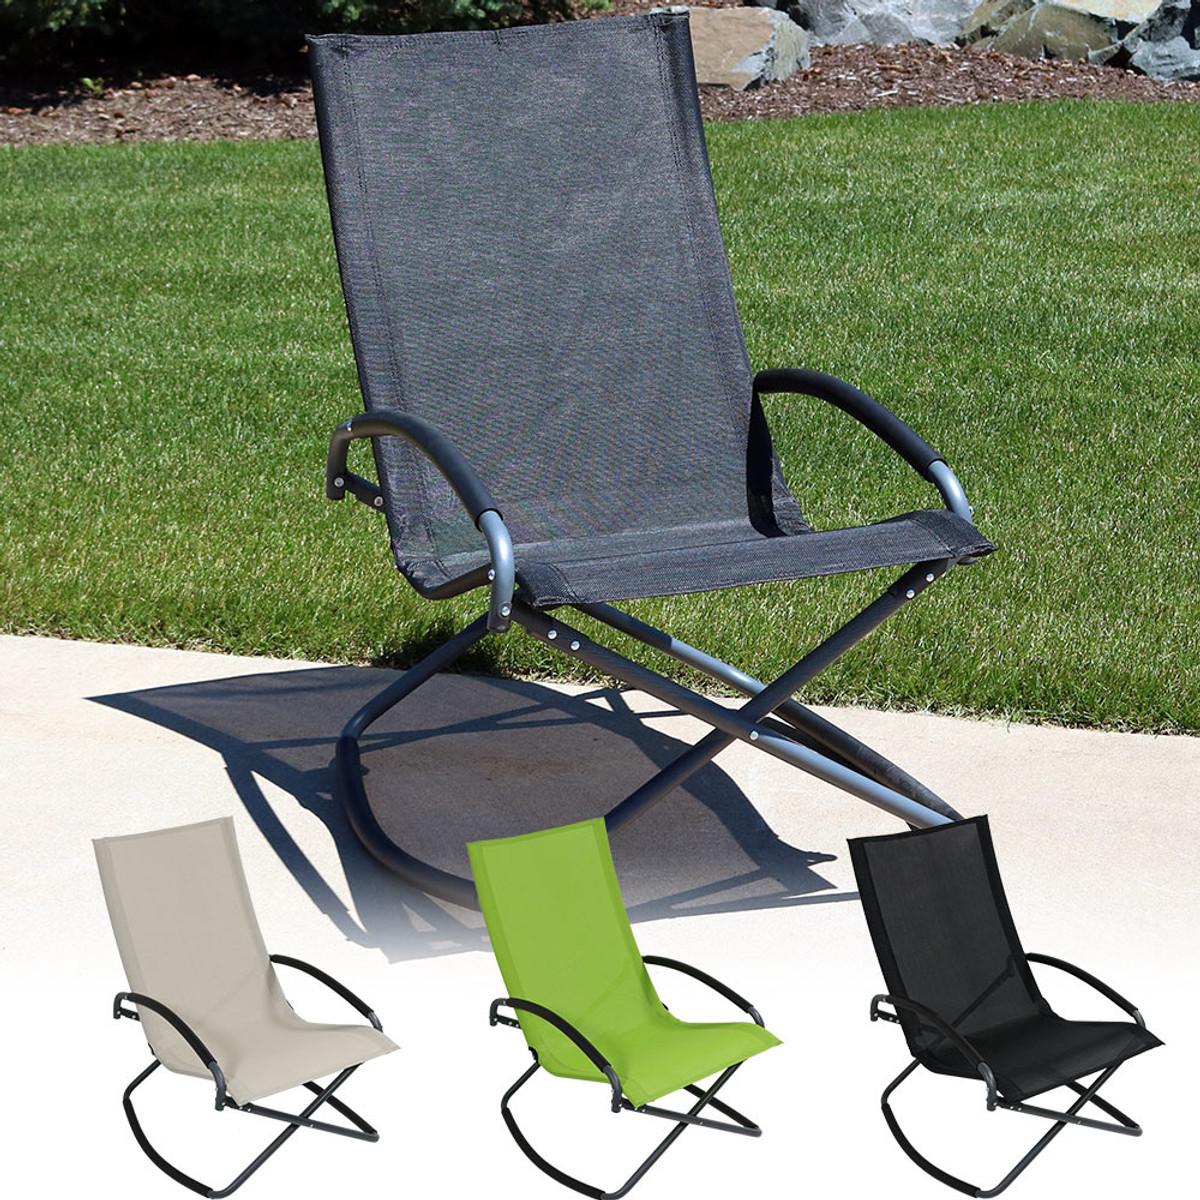 Sunnydaze Folding Rocking Lounge Chair & Sunnydaze Folding Rocking Lounge Chair | Outdoor Living